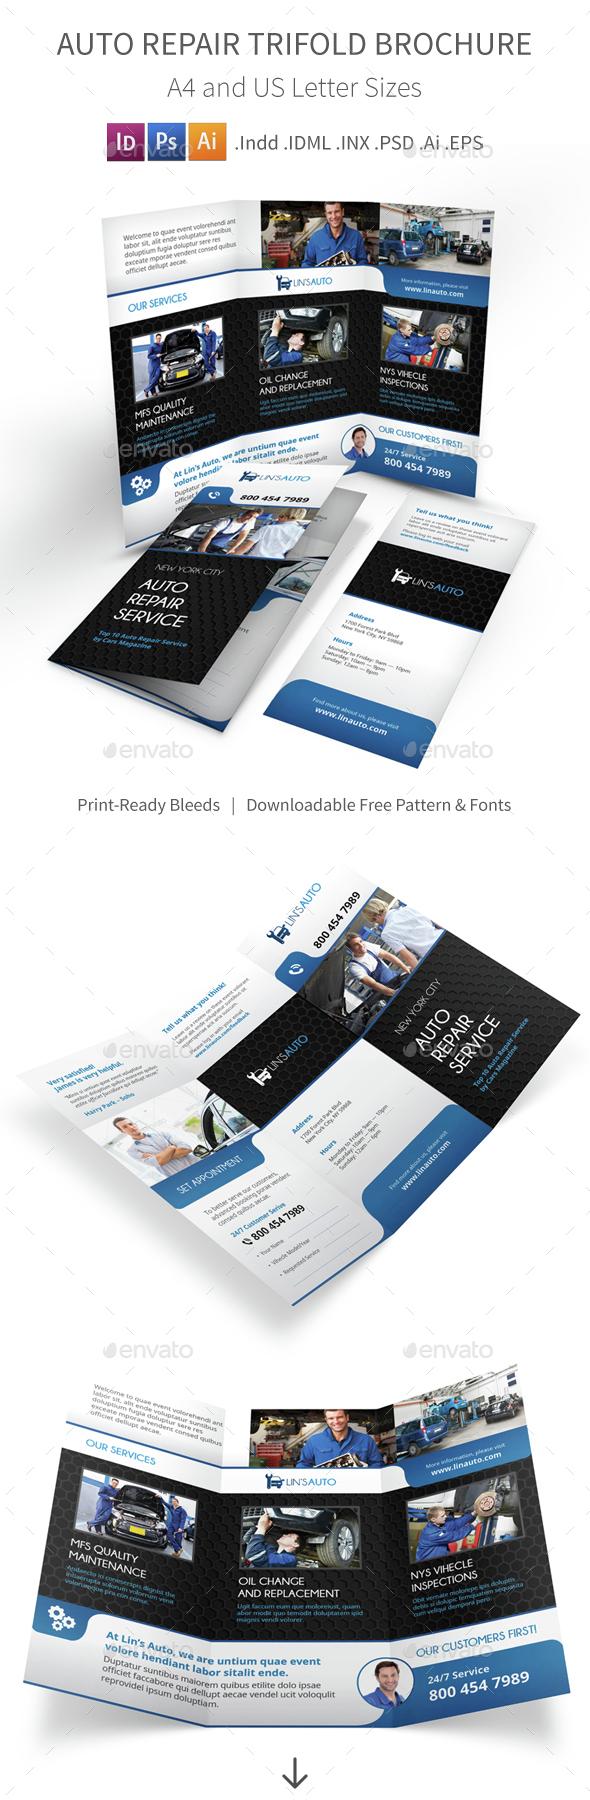 Auto Repair Trifold Brochure - Informational Brochures